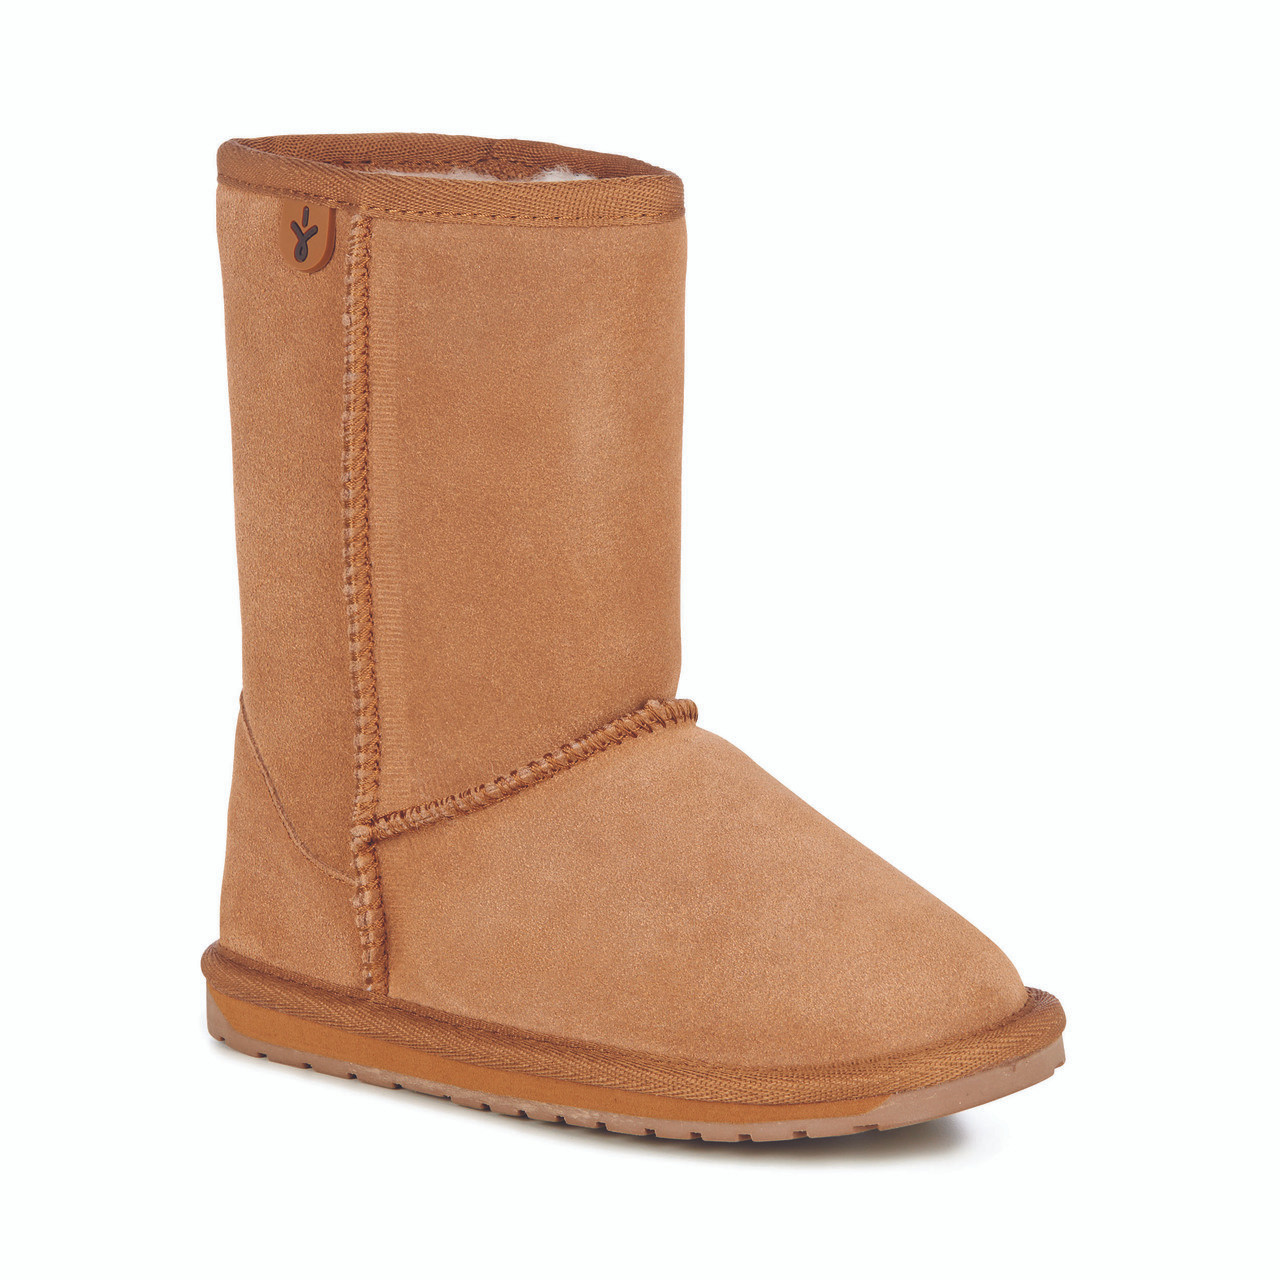 6234d711e5 EMU Australia Wallaby Lo for Kids Sheepskin Boots | Skinnys